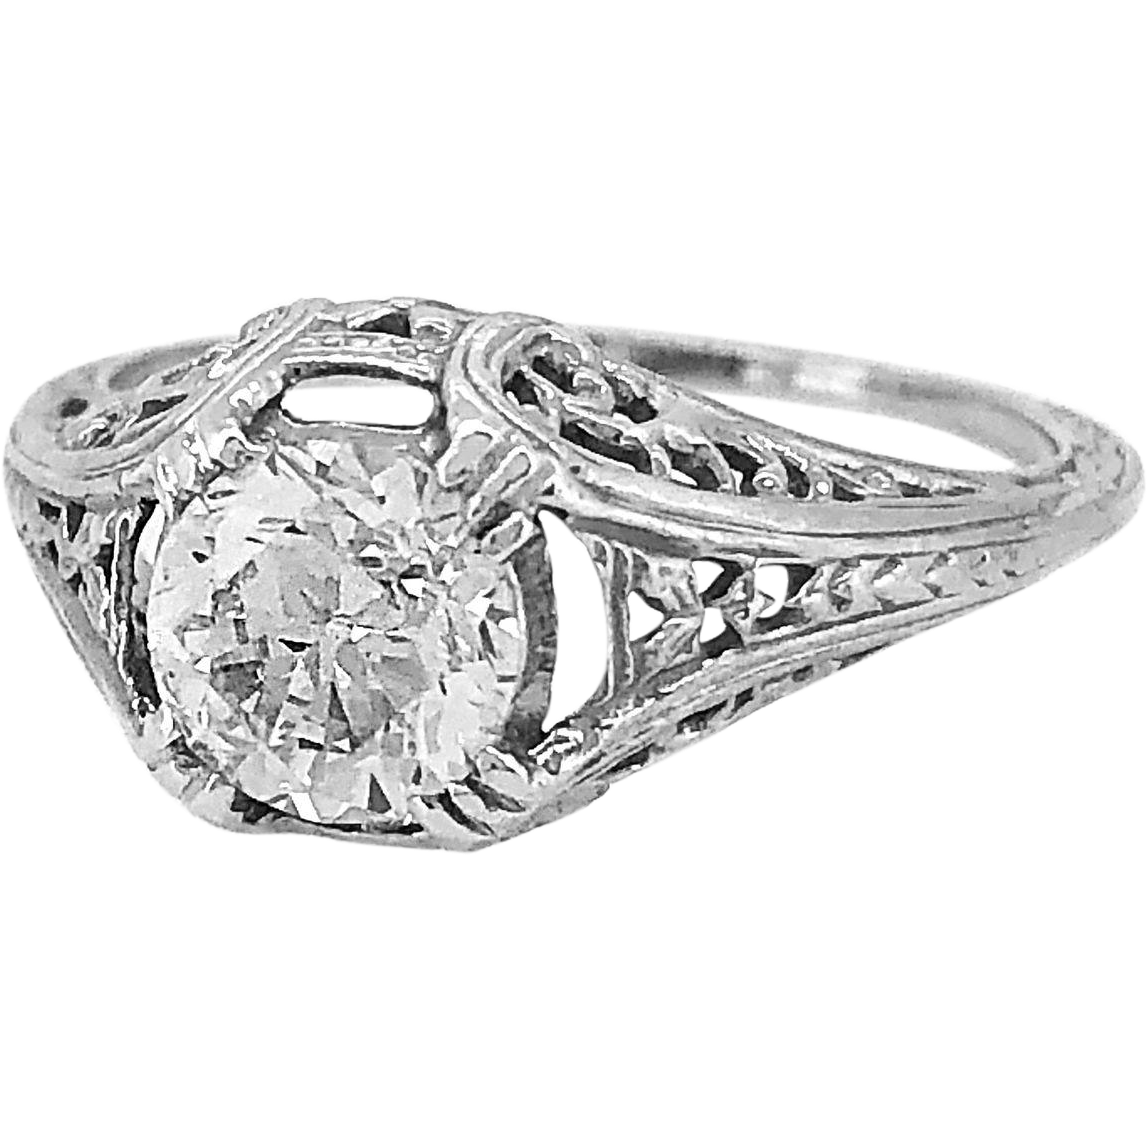 1.01ct. Diamond & White Gold Art Deco Engagement Ring - J34008